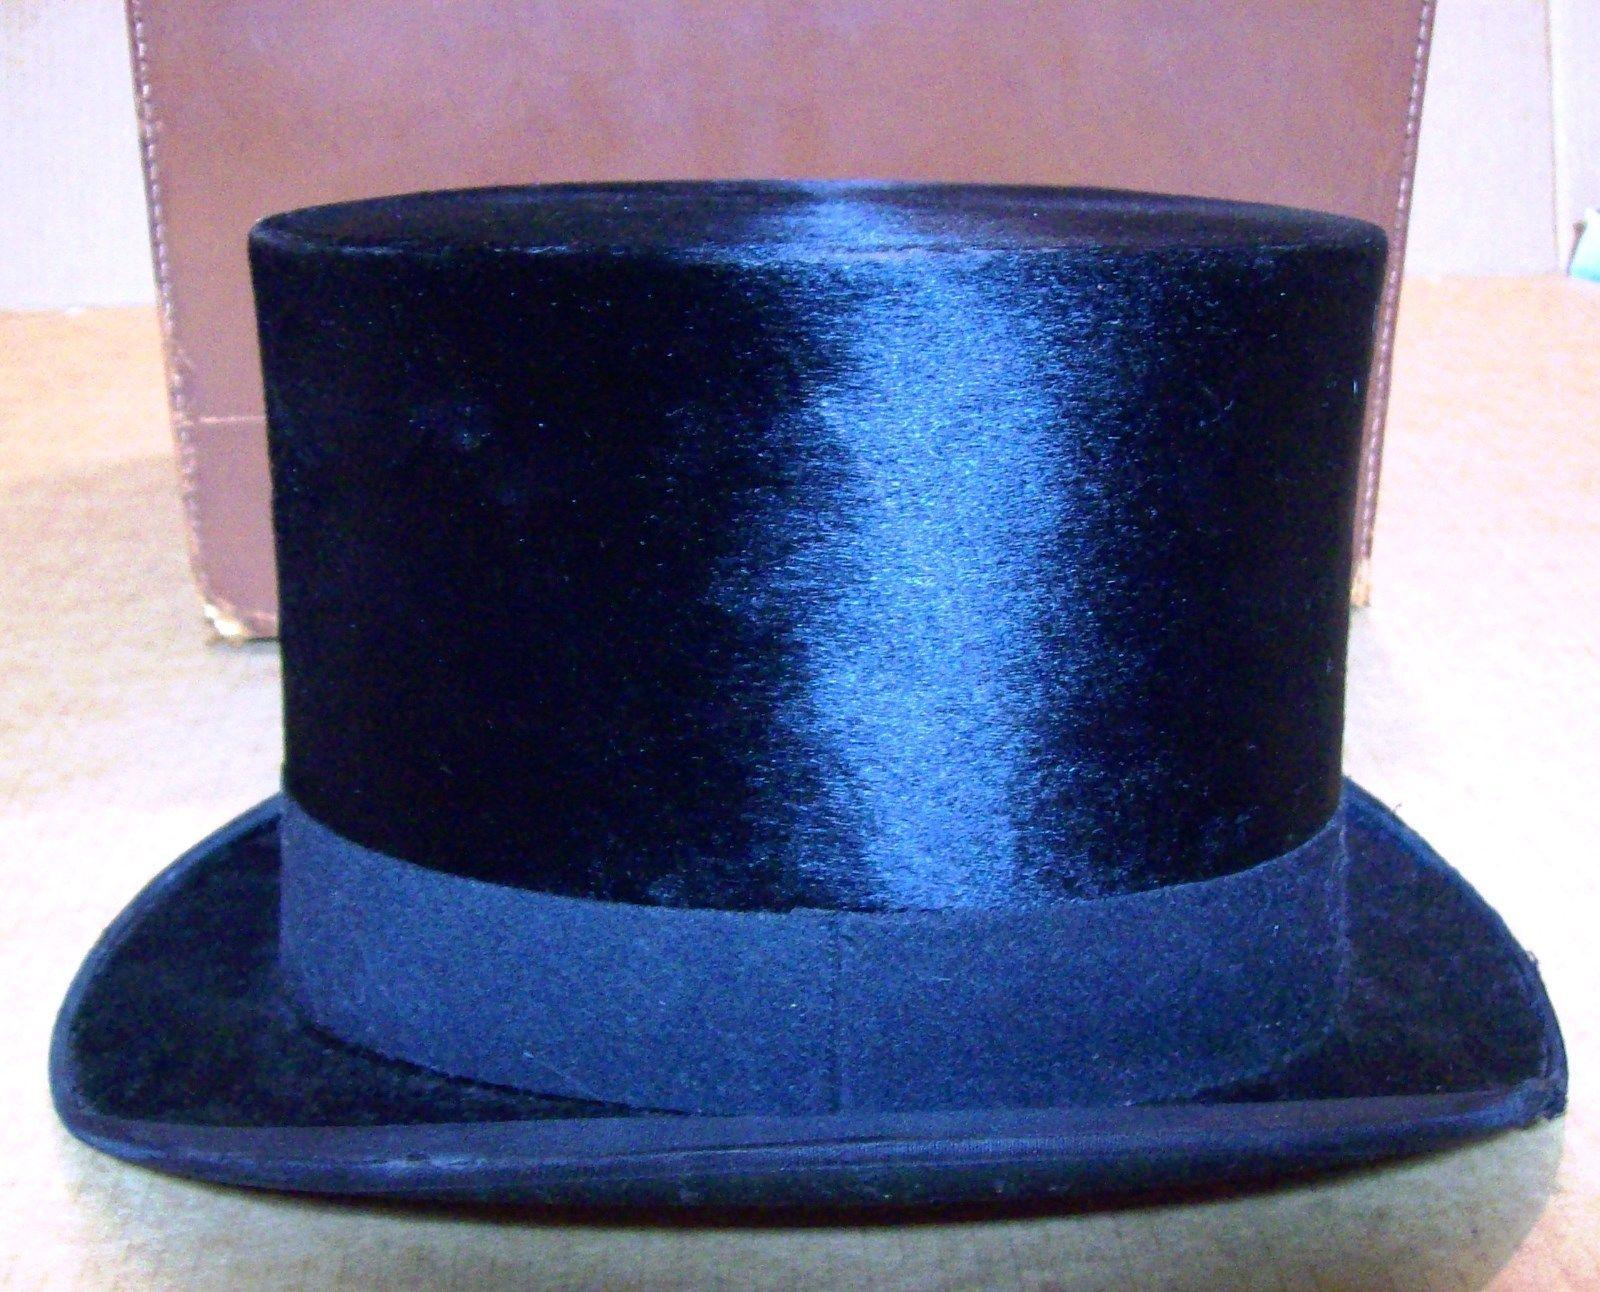 Austin Reed Beaver Felt Top Hat With Original Box And Keys Ebay Austin Reed Top Hat Original Box